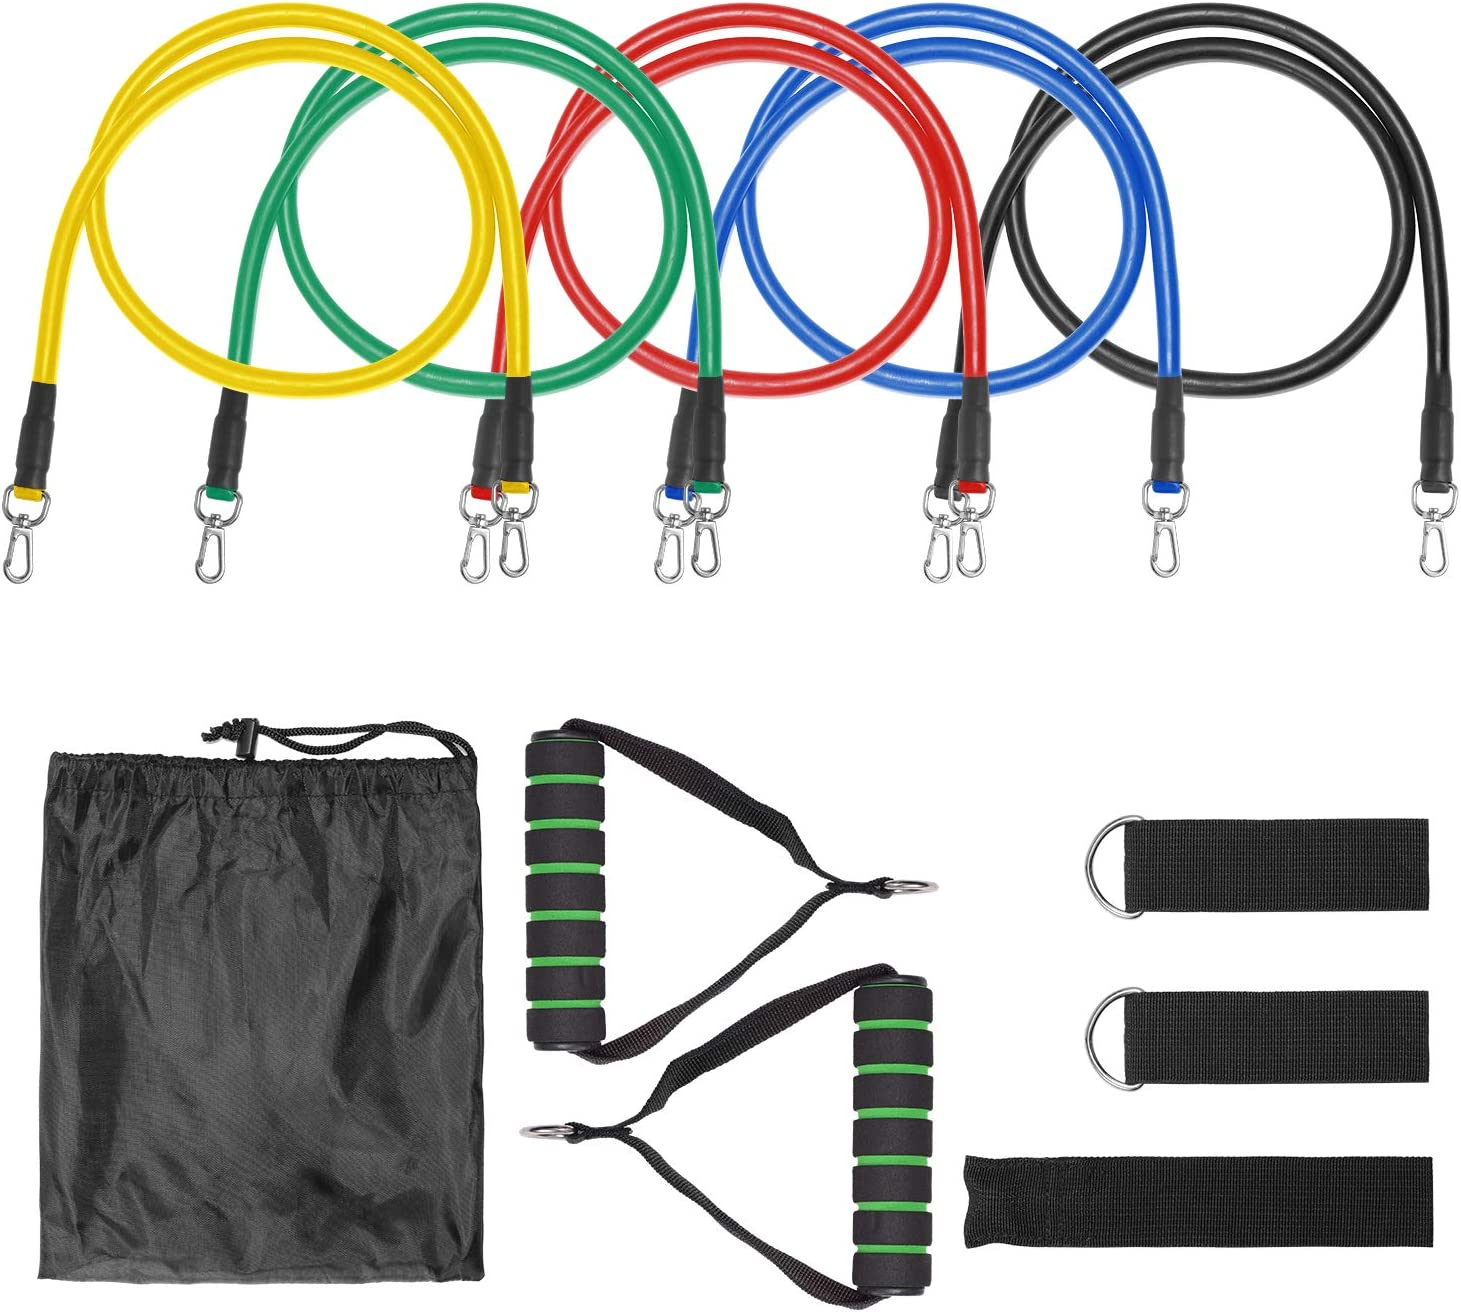 Bleu Gym Cheville//pied Sangle câble machine fixation simple Nouveau AB Jambe /& GLUTE